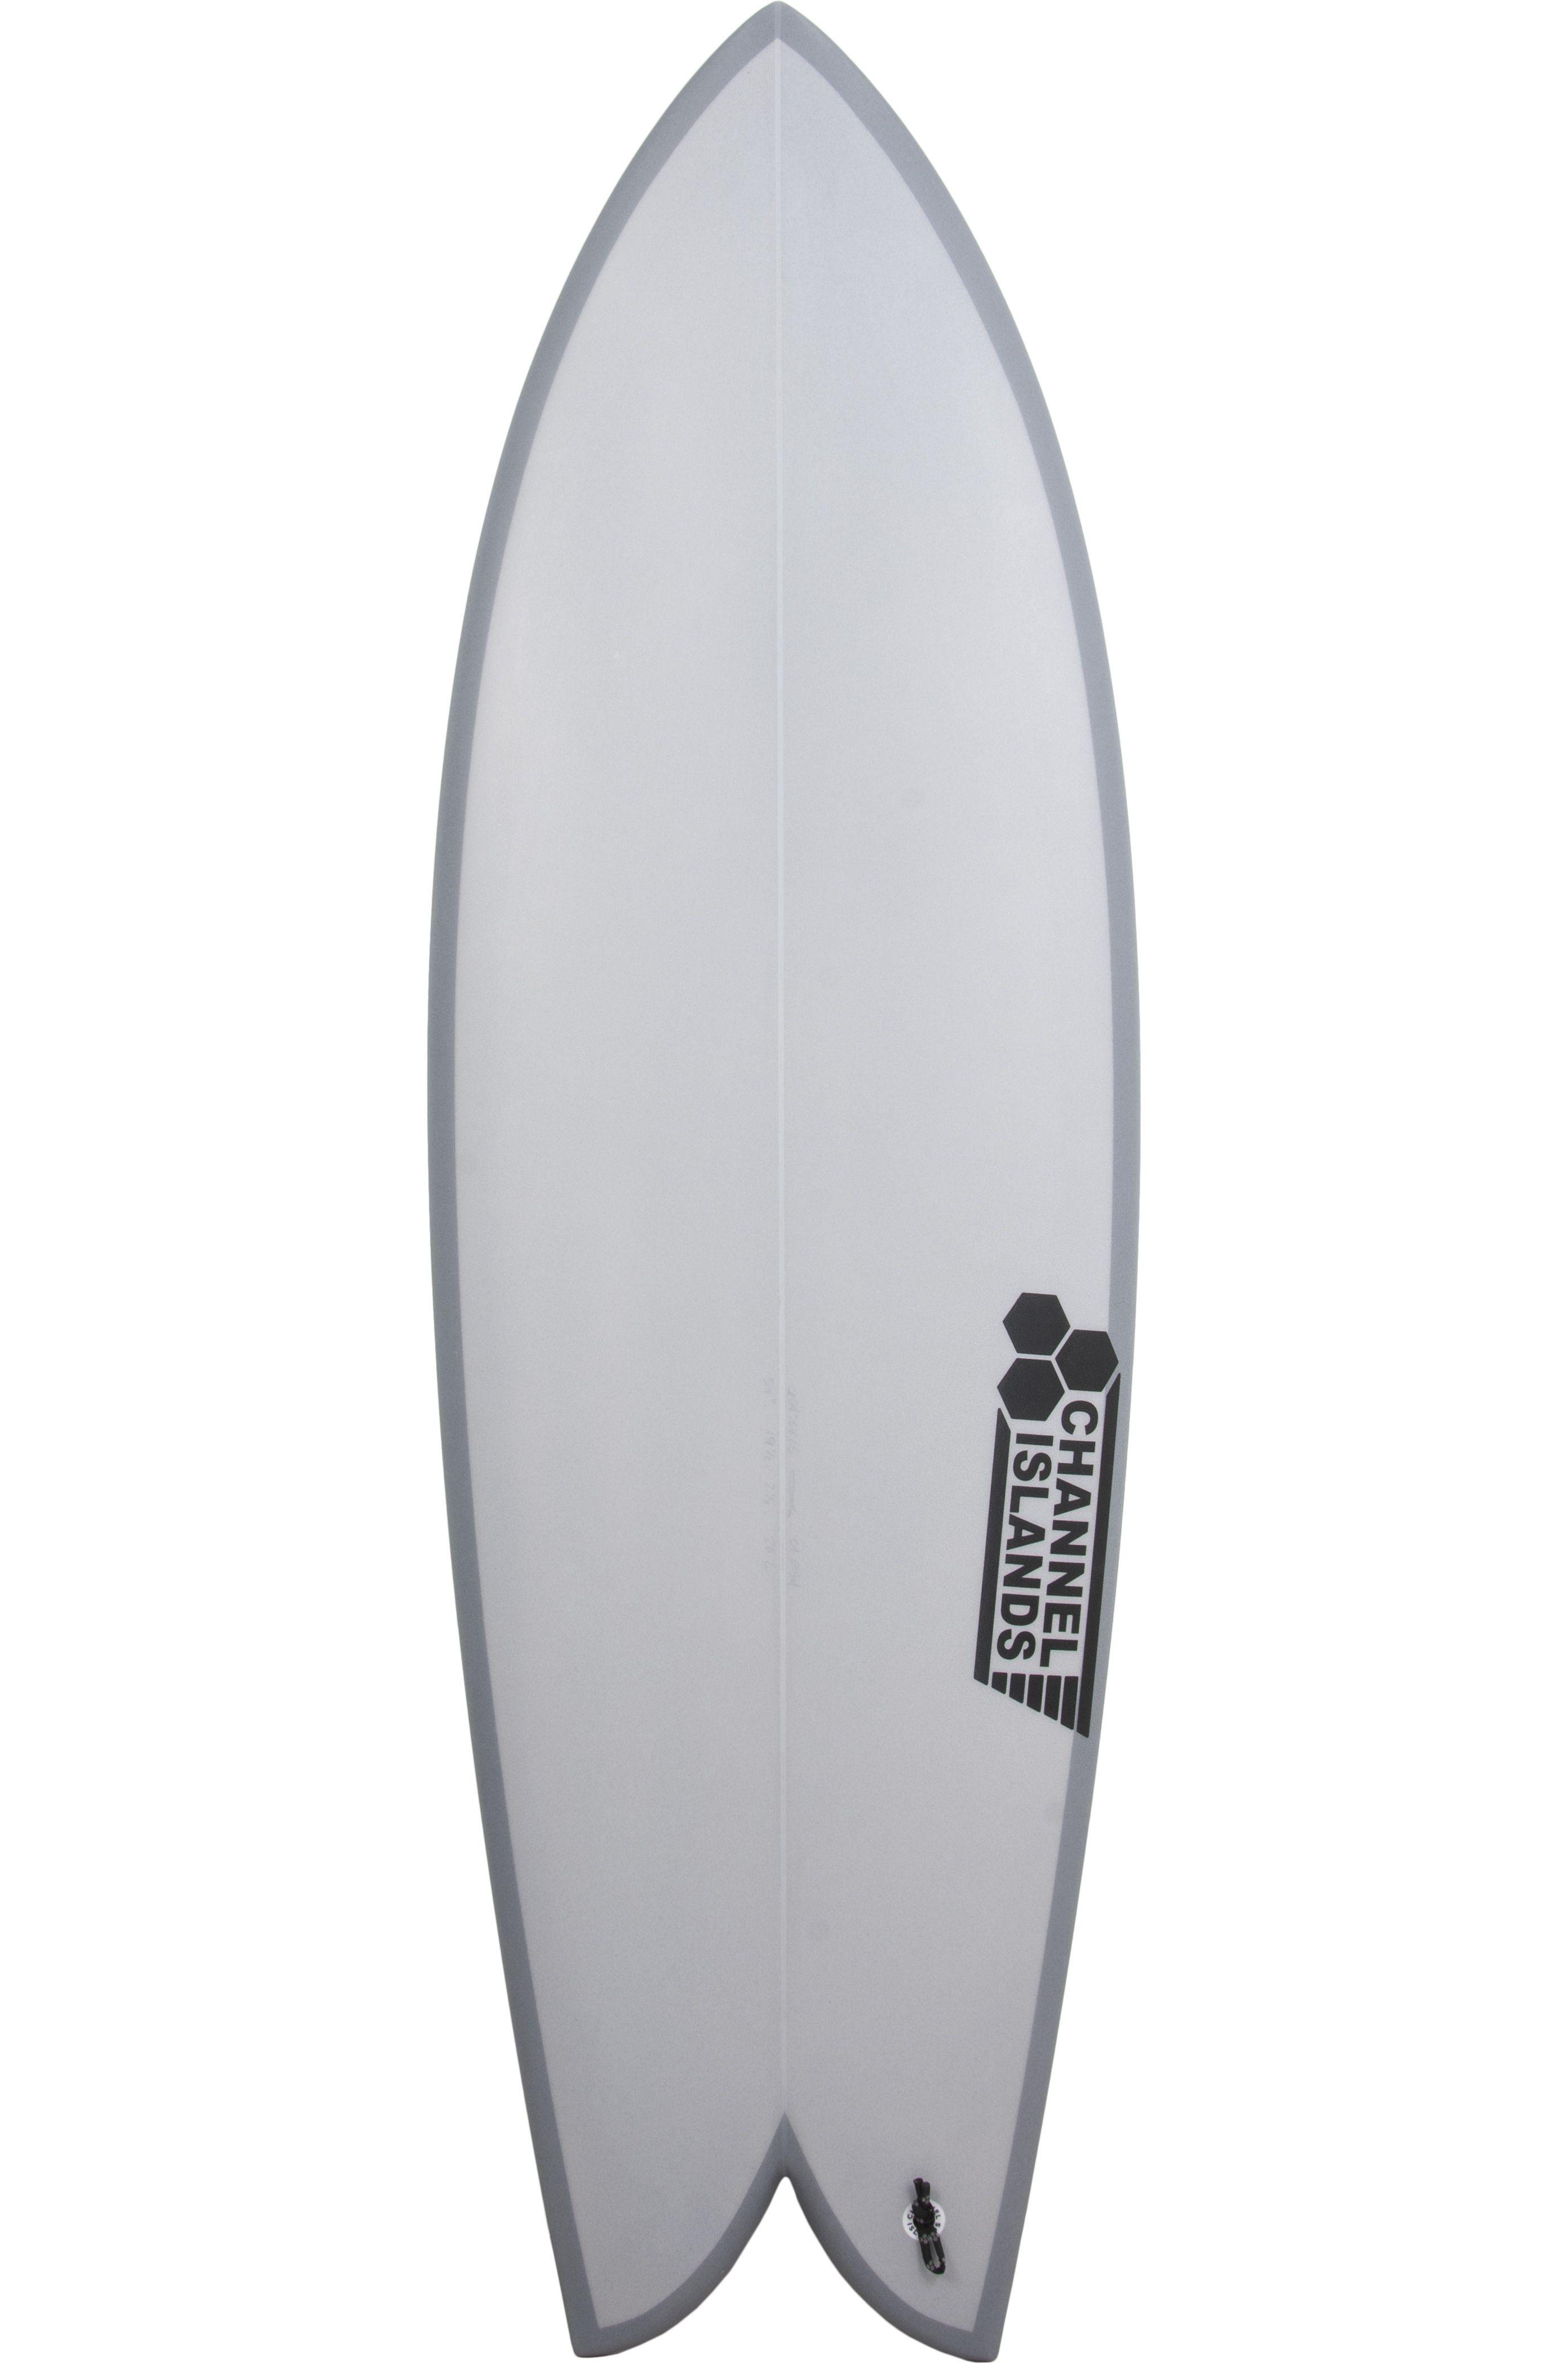 Prancha Surf Al Merrick CI FISH 5'6 Swallow Tail - Color Futures Twin 5ft6